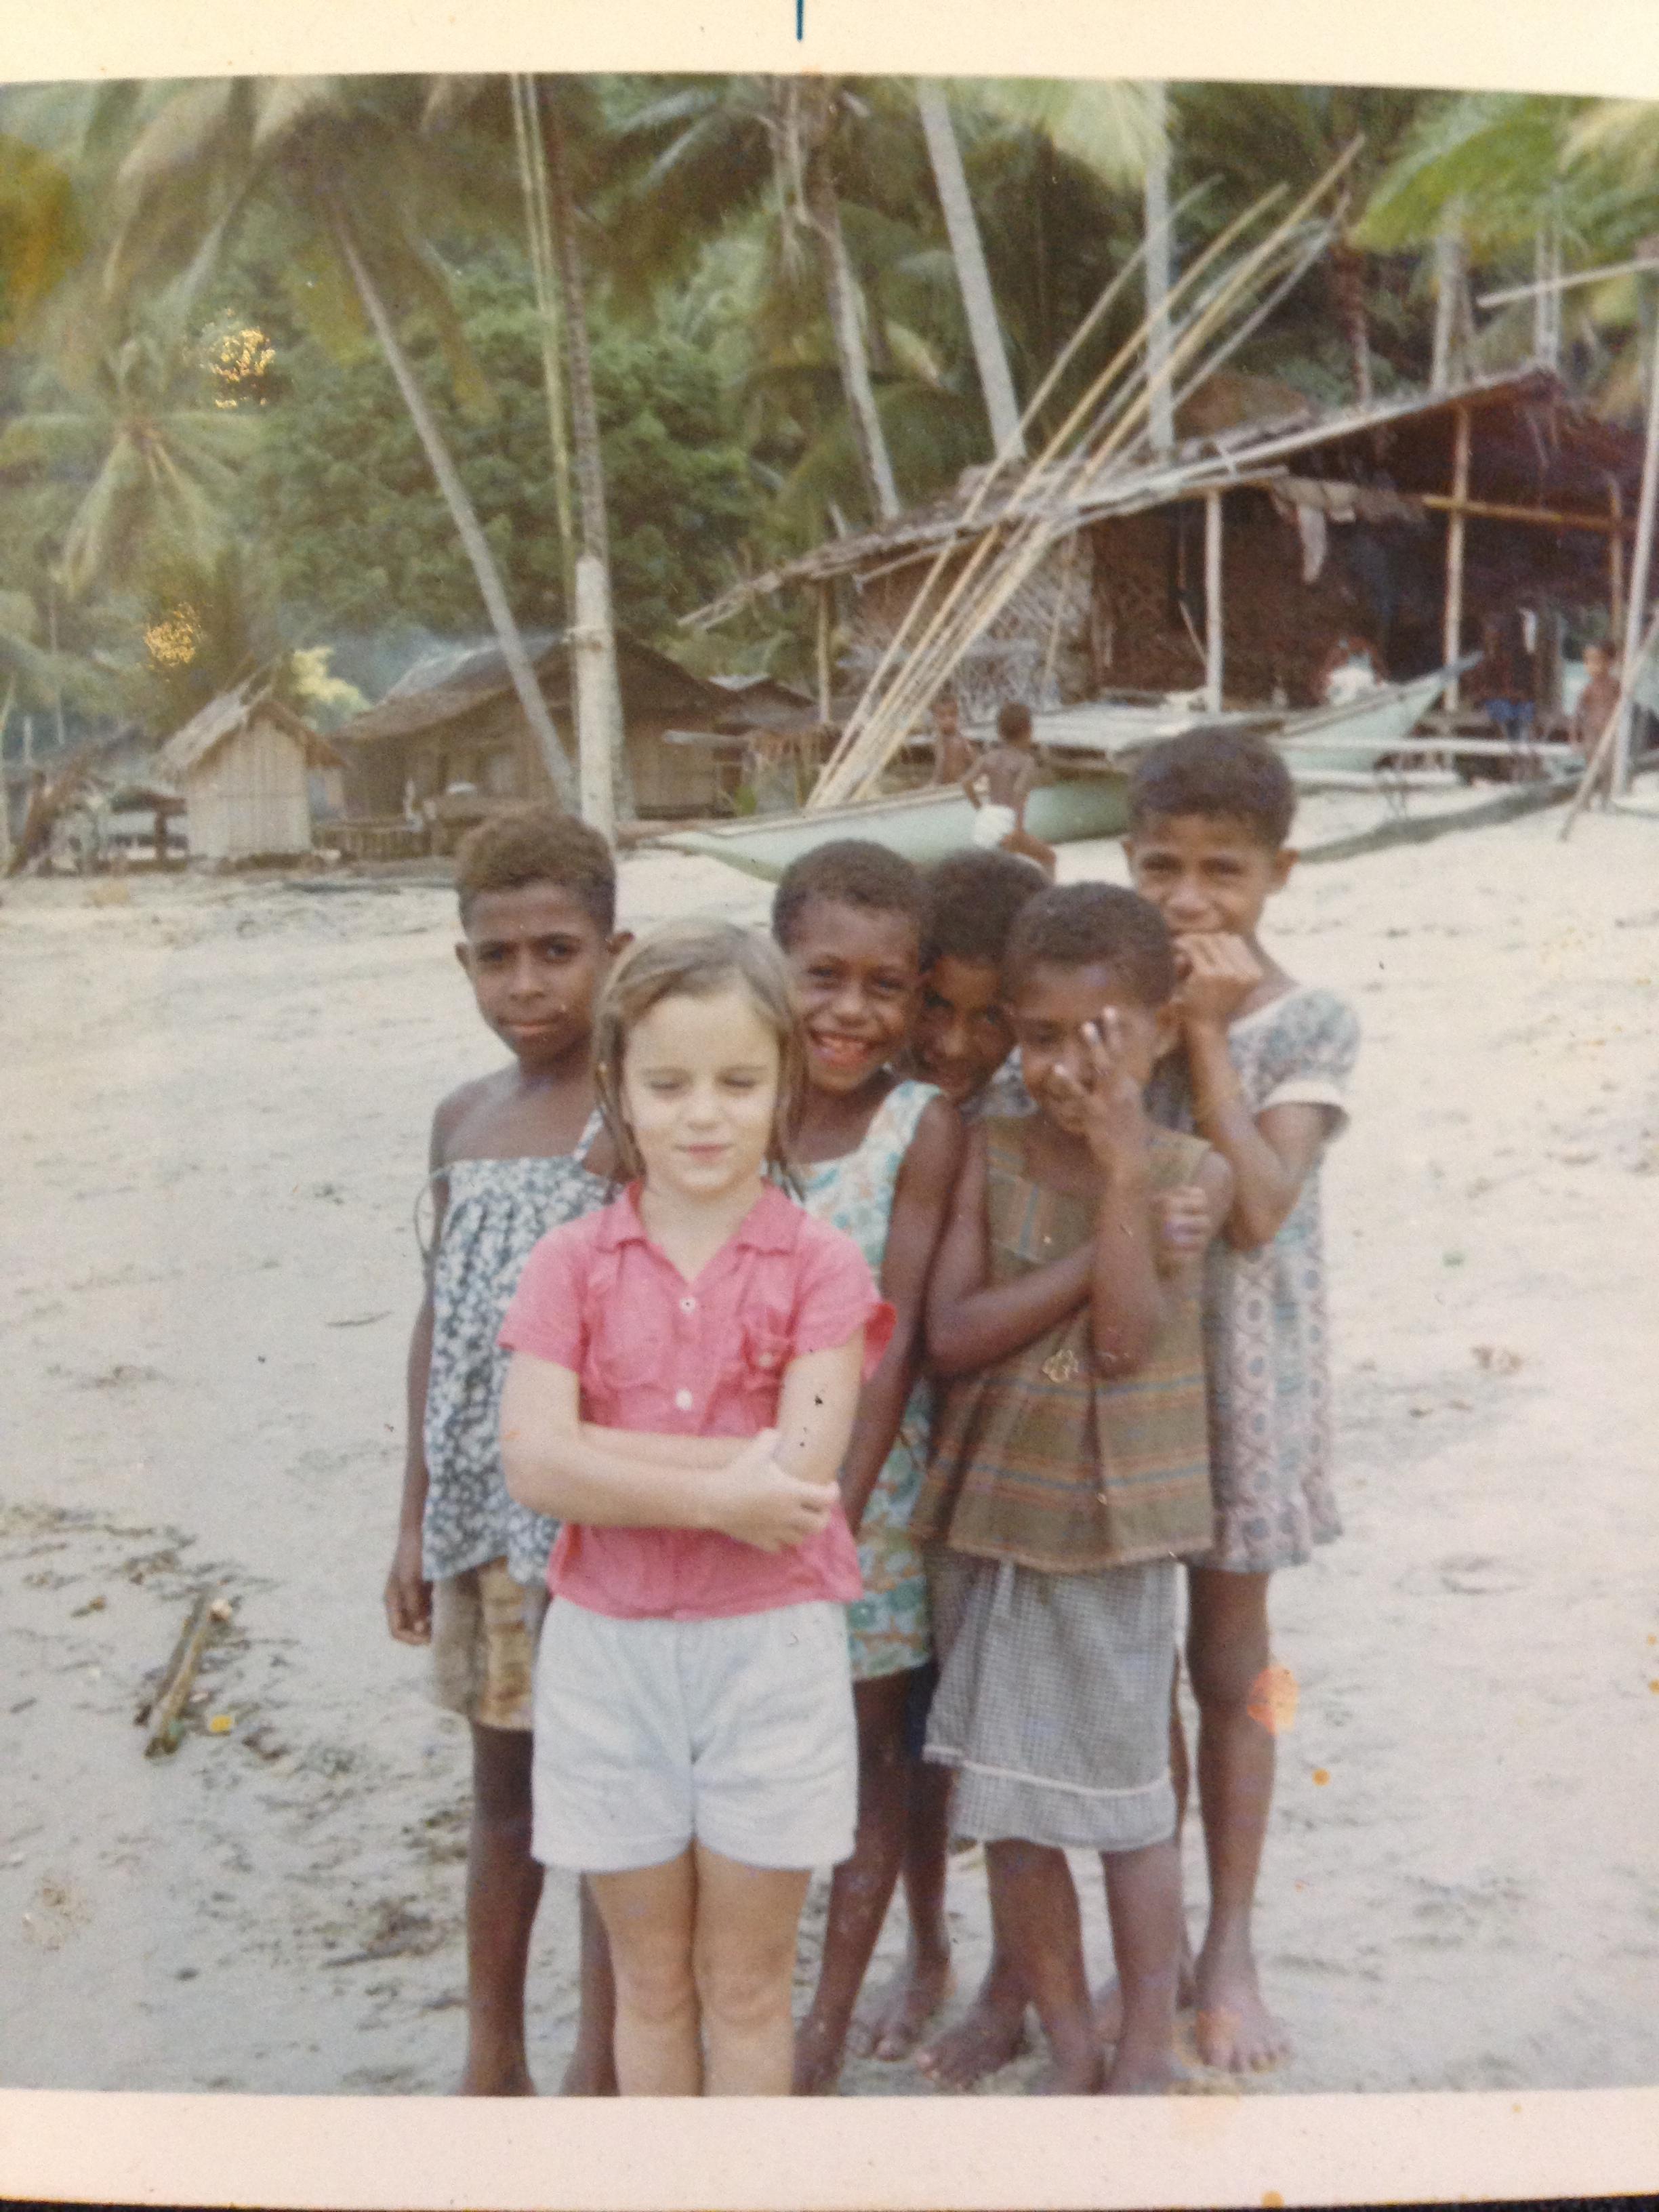 Josephine Pennicott in Lae Papua New Guinea